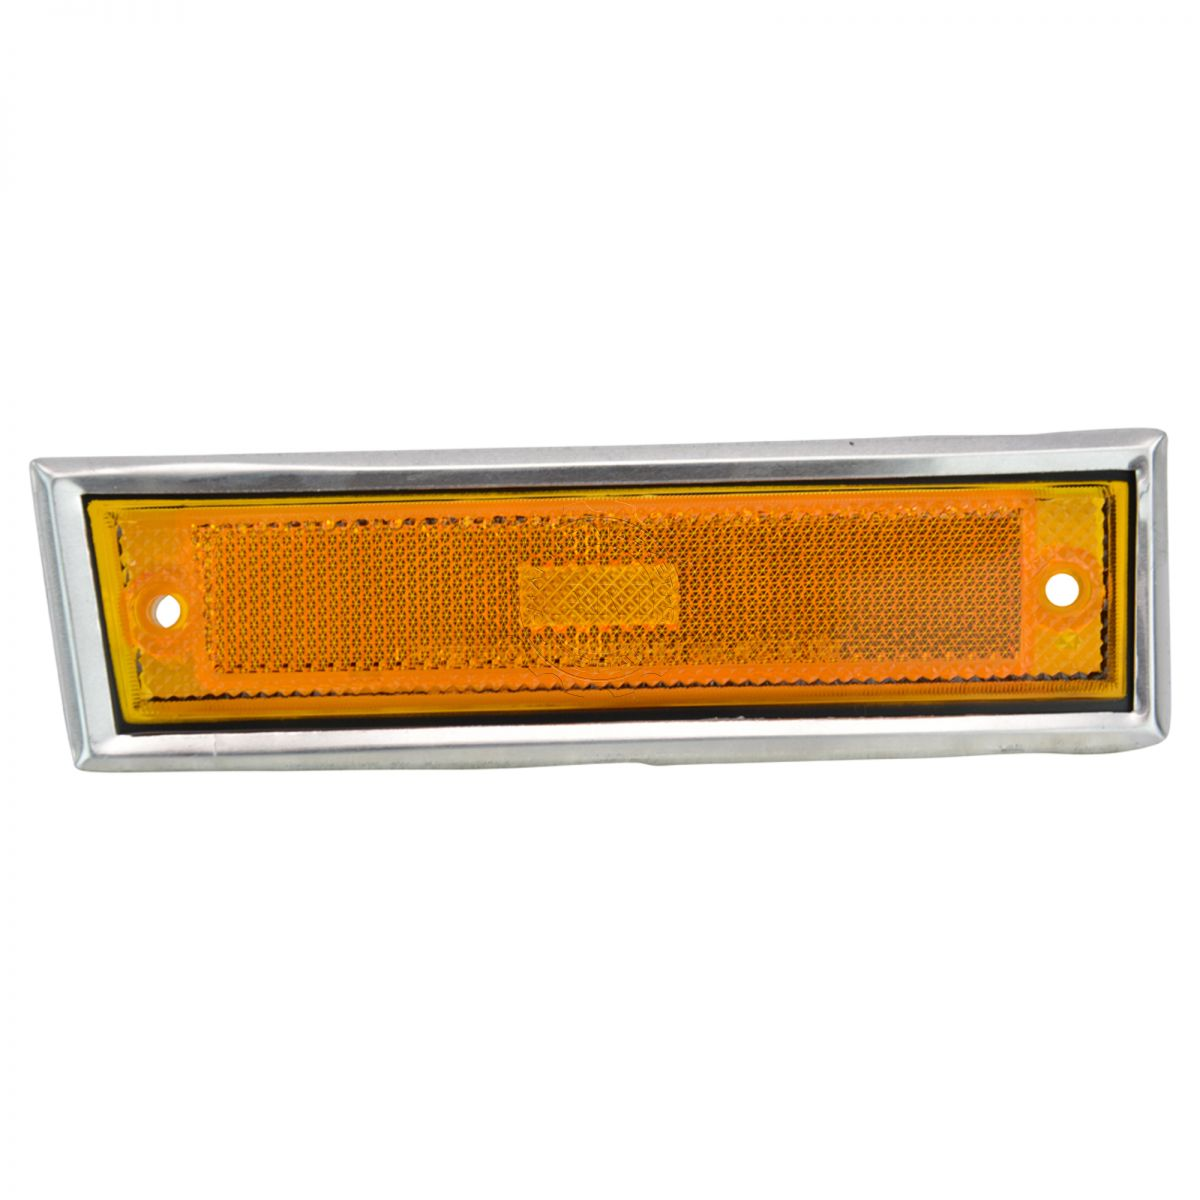 Jimmy Turn Signal Corner Light Lamp Passenger Side Replacement Blazer For 1981 1982 1983 1984 1985 1986 1987 1988 1989 1990 1991 Chevrolet Chevy//Gmc C//K 10 Suburban